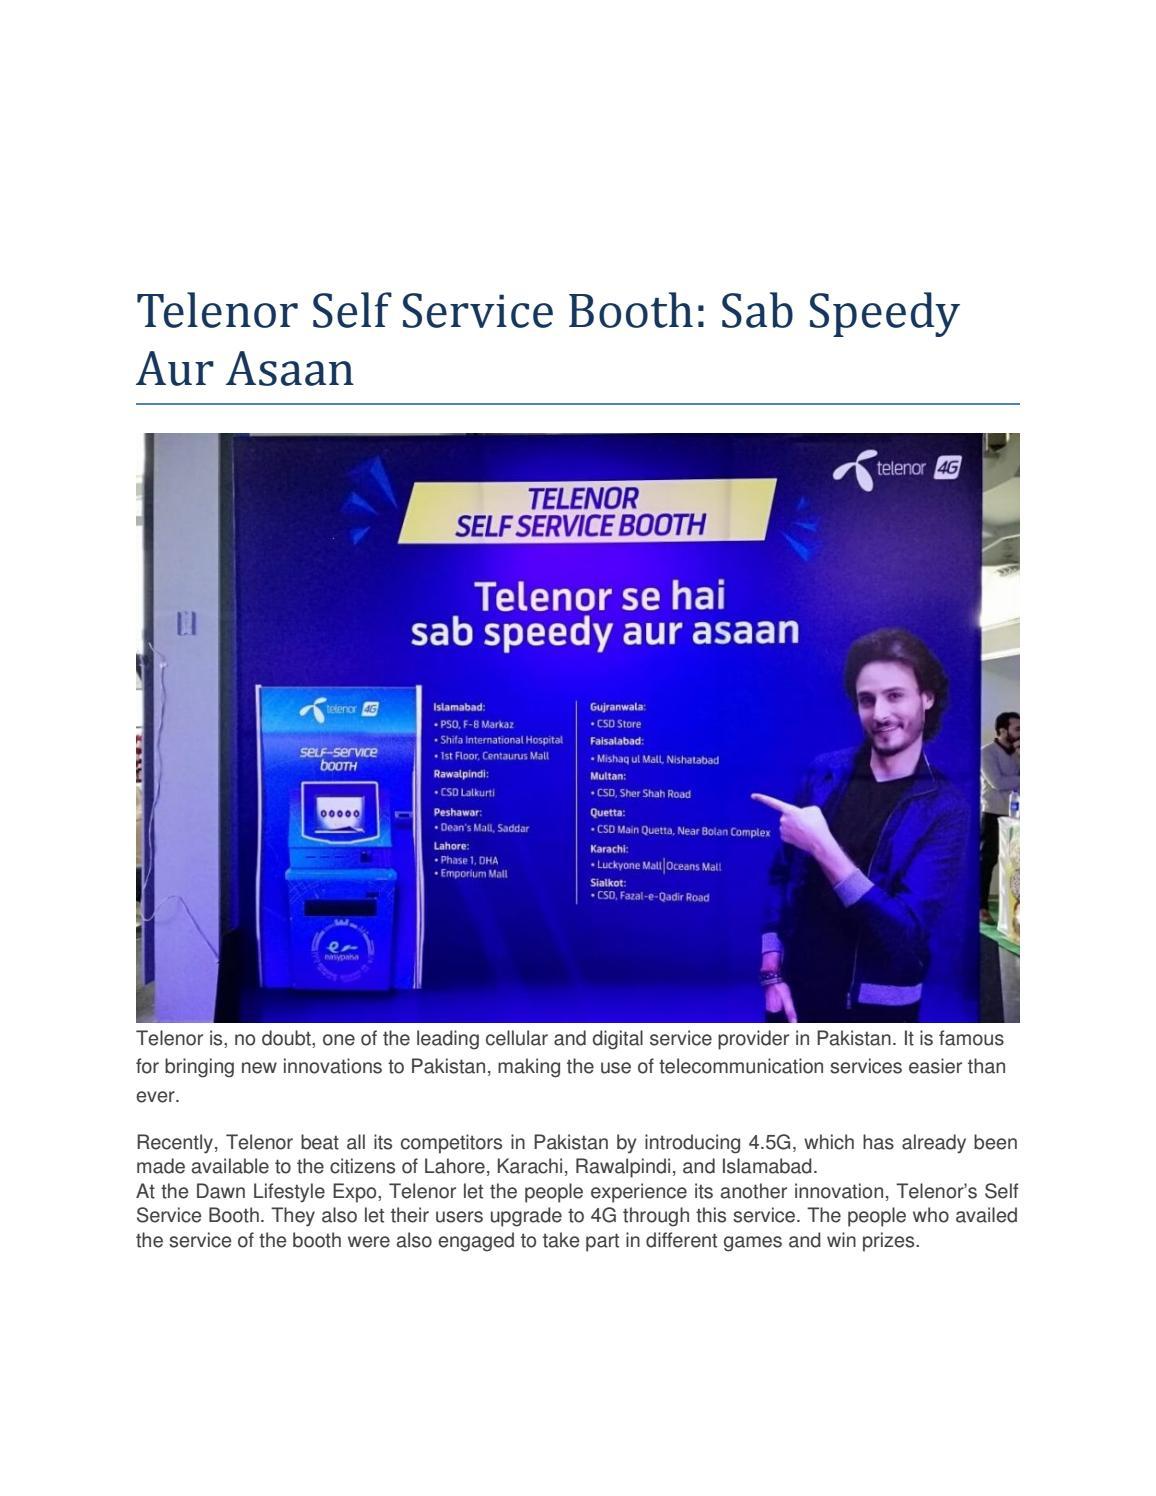 Telenor Self Service Booth: Sab Speedy Aur Asaan by